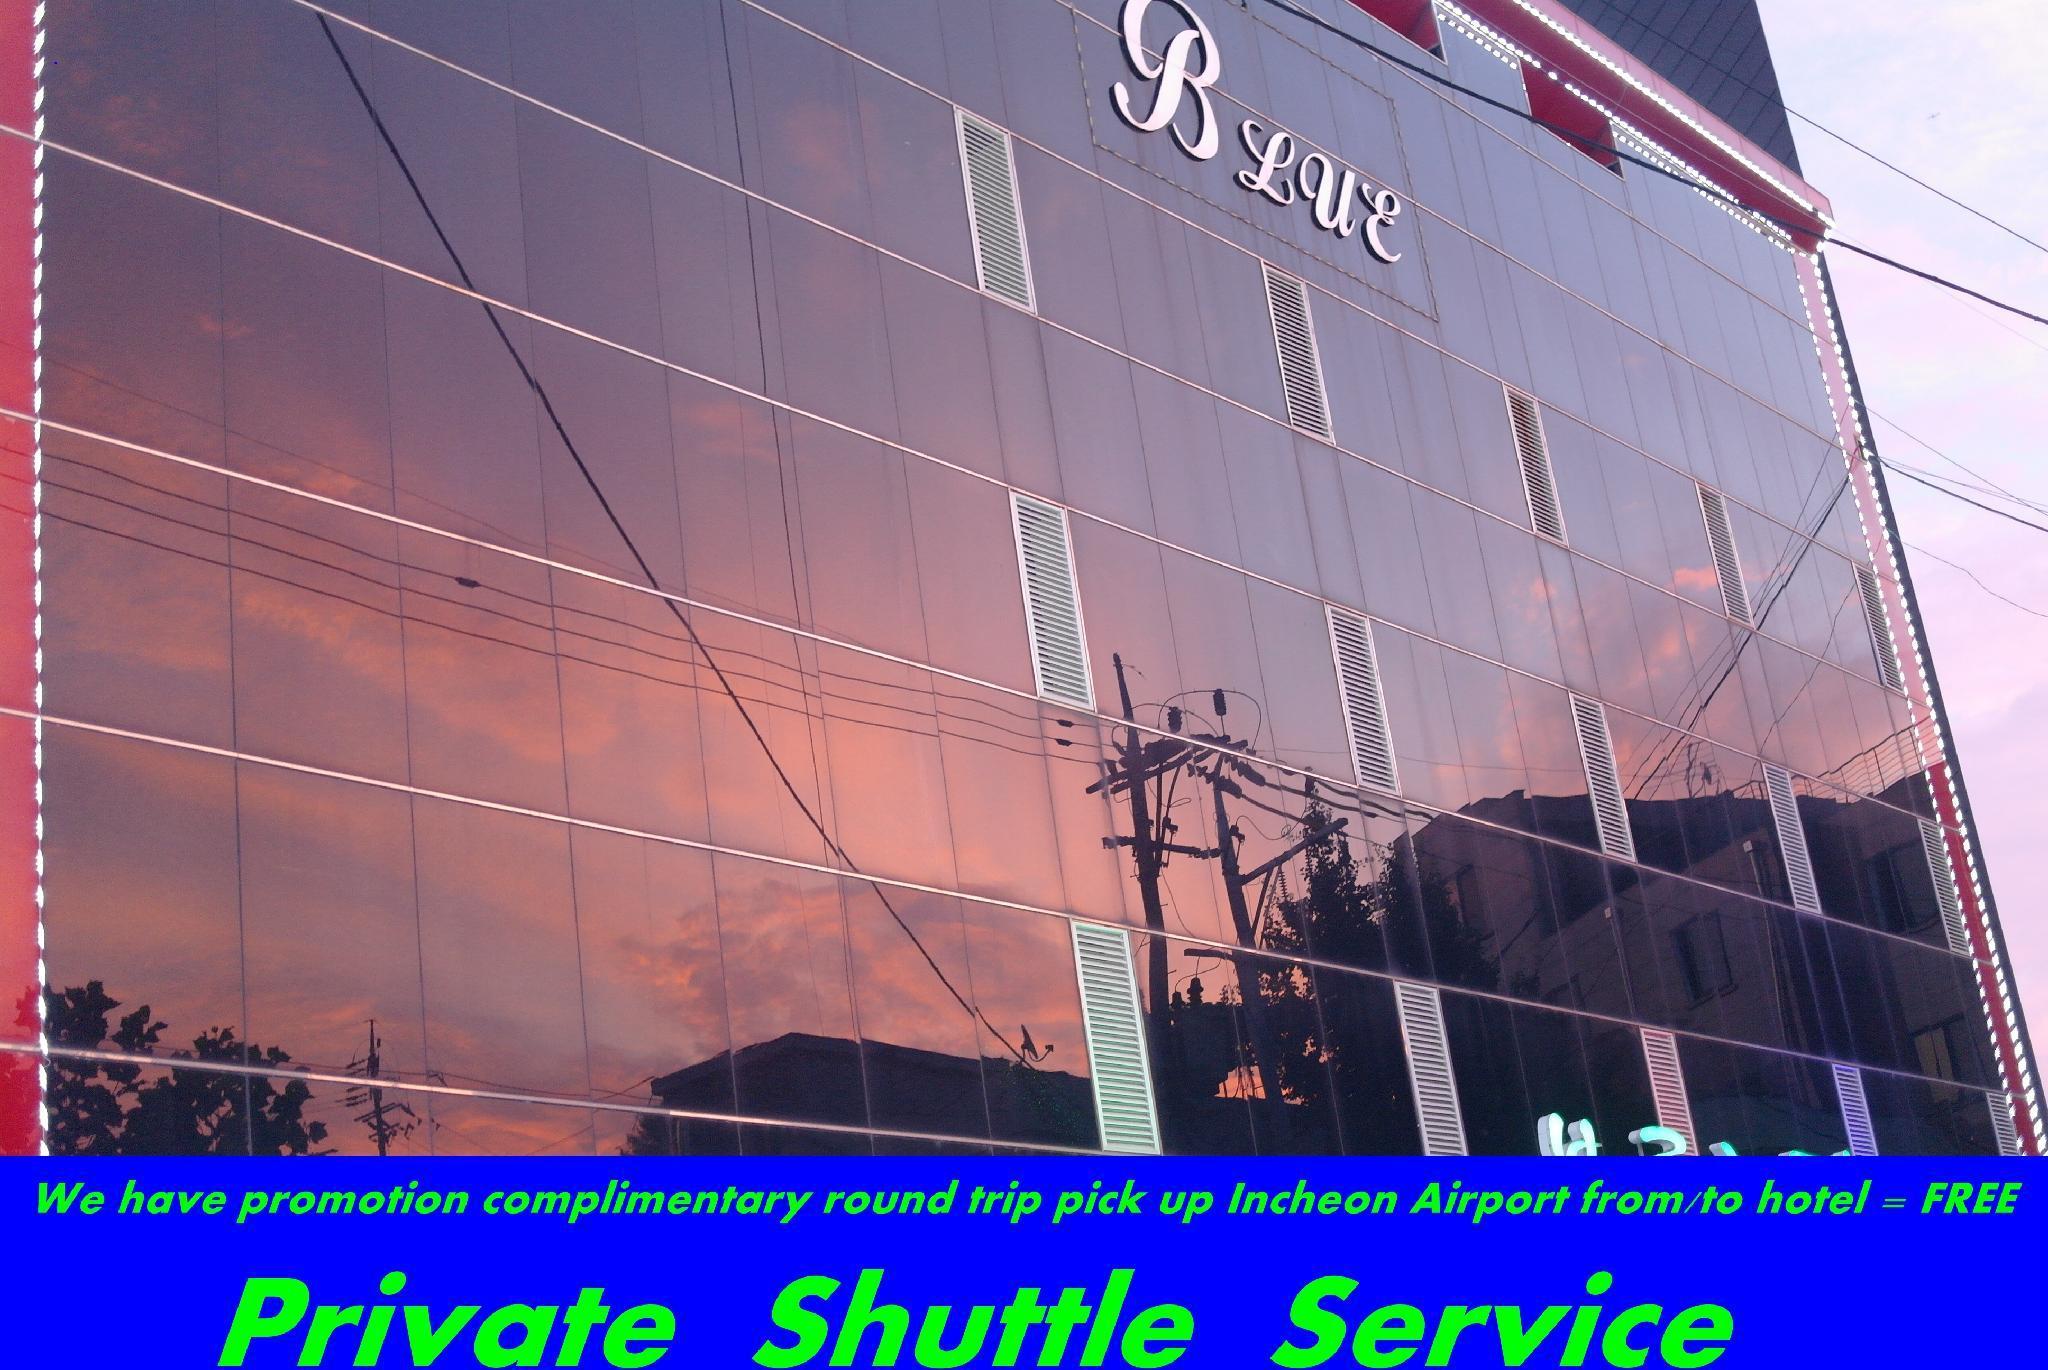 Songdo Blue Hotel, Yeonsu